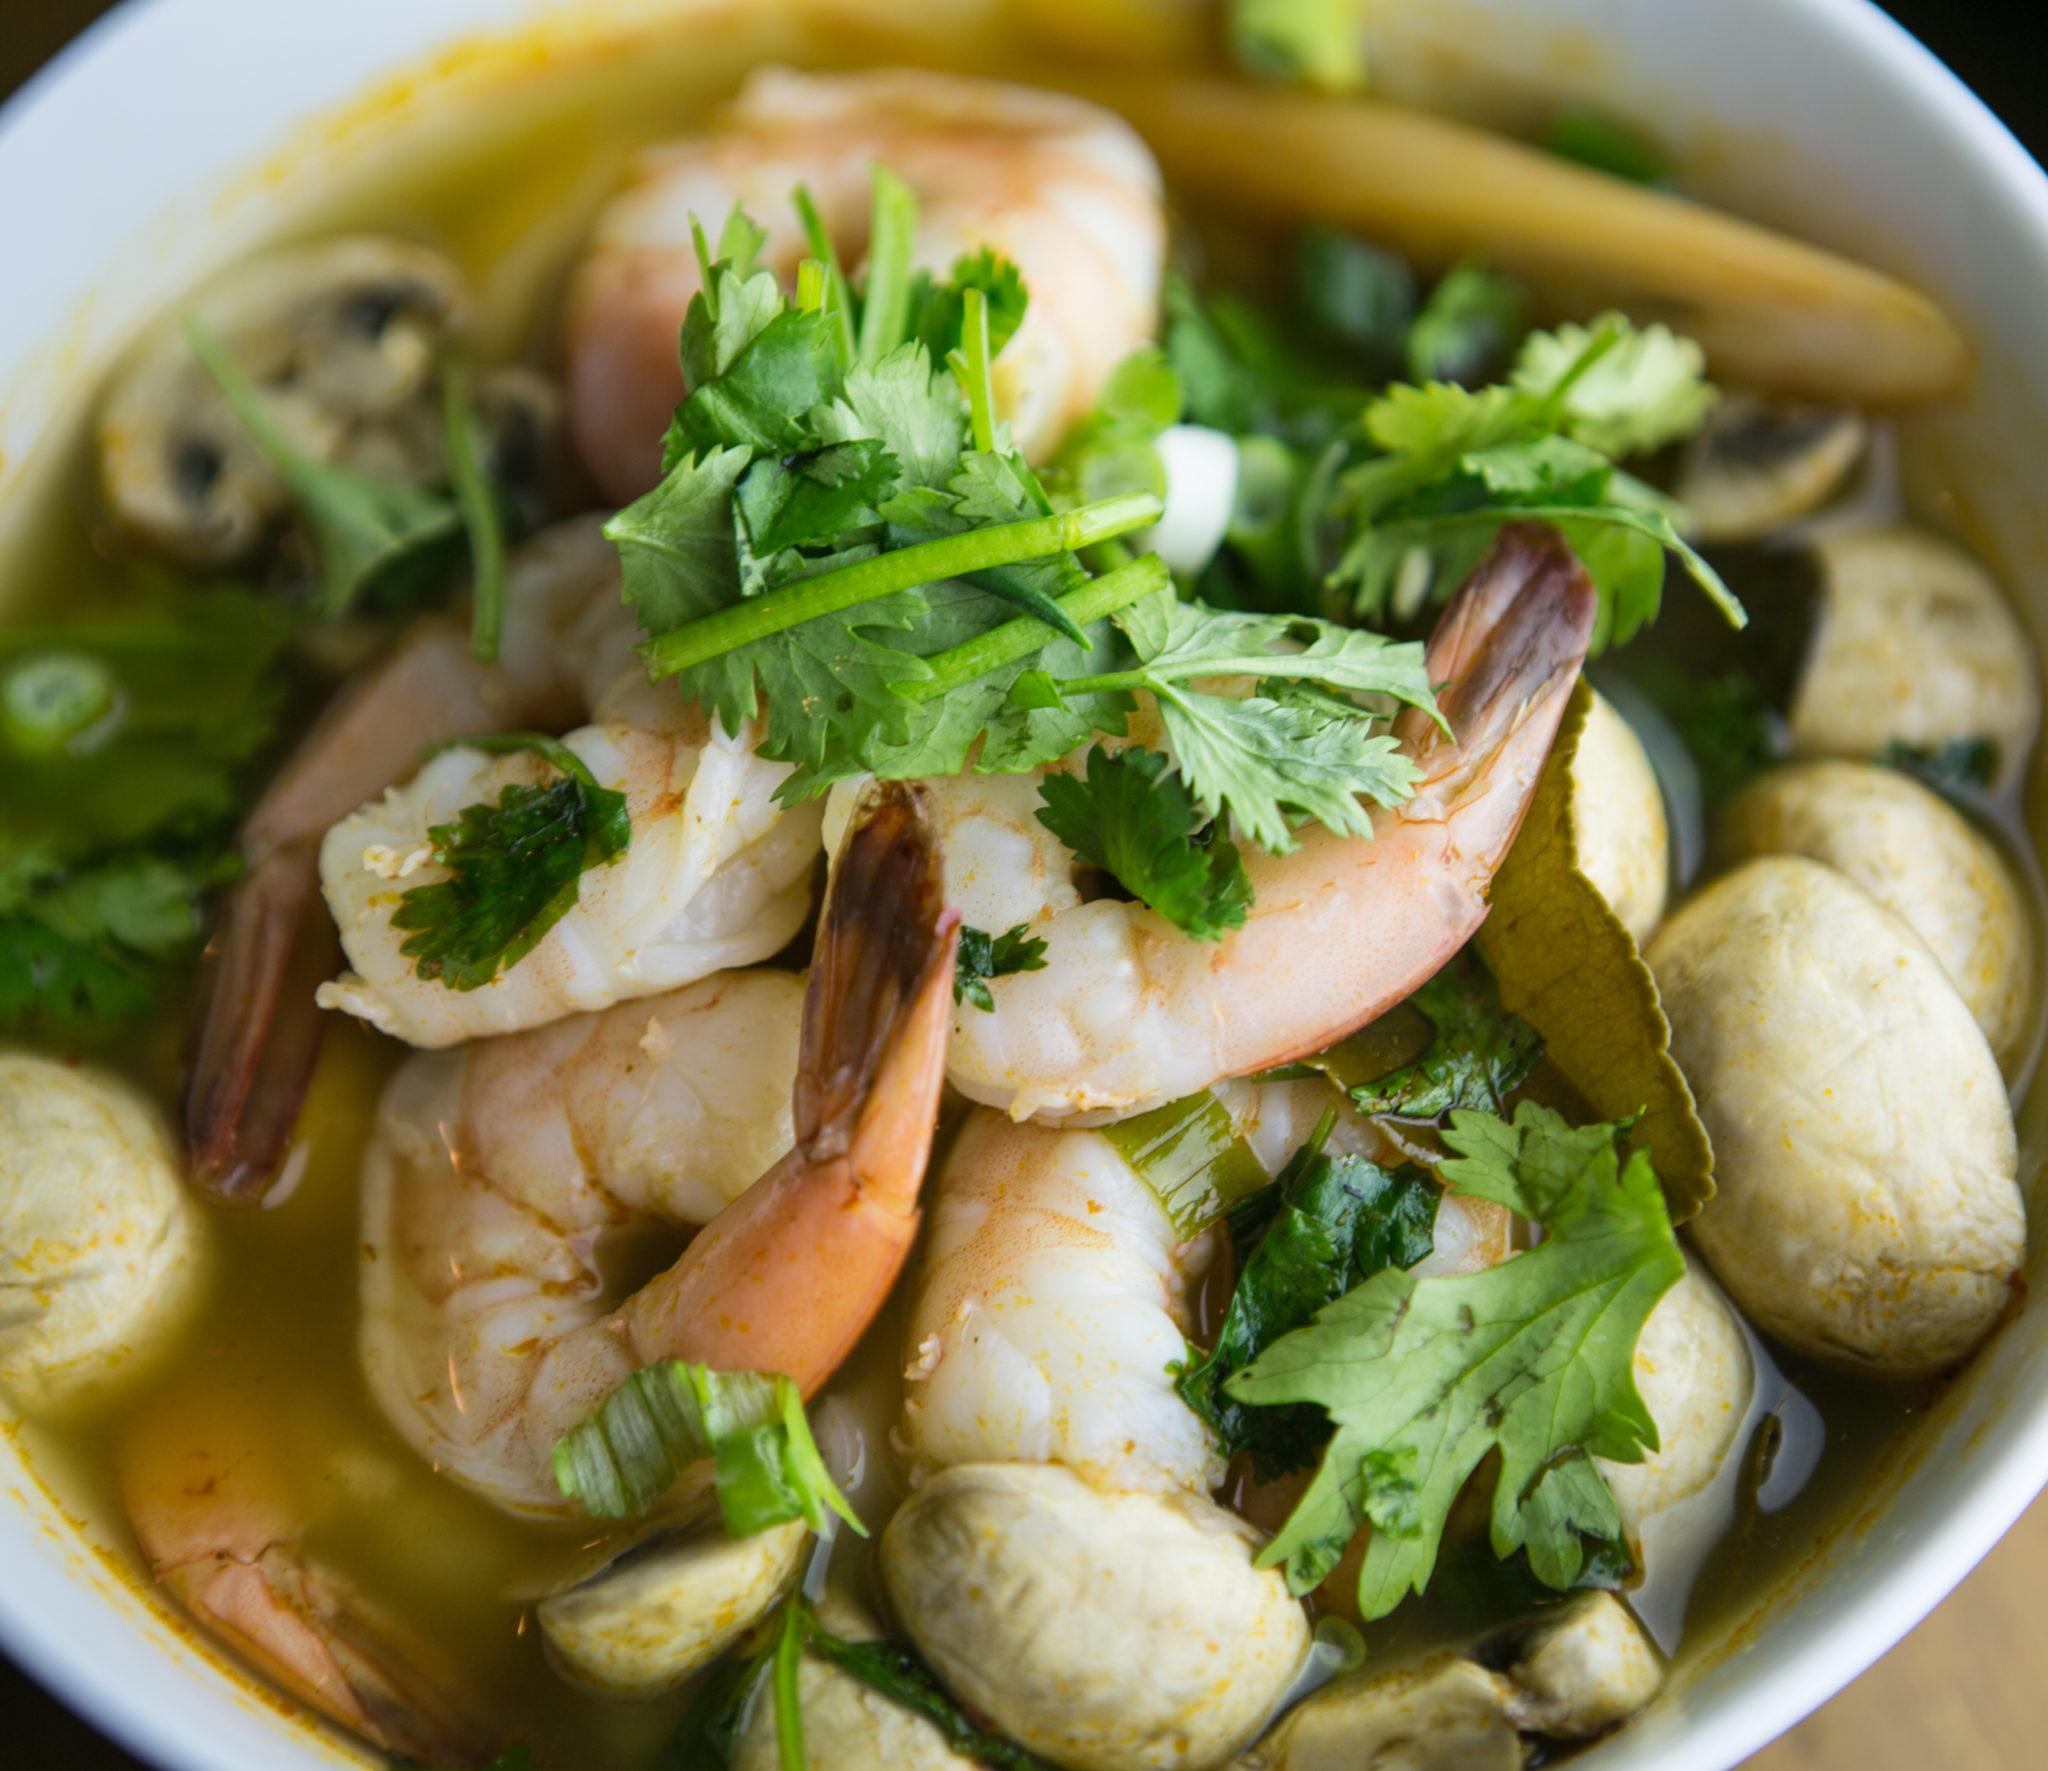 Healthiest Thai food staples